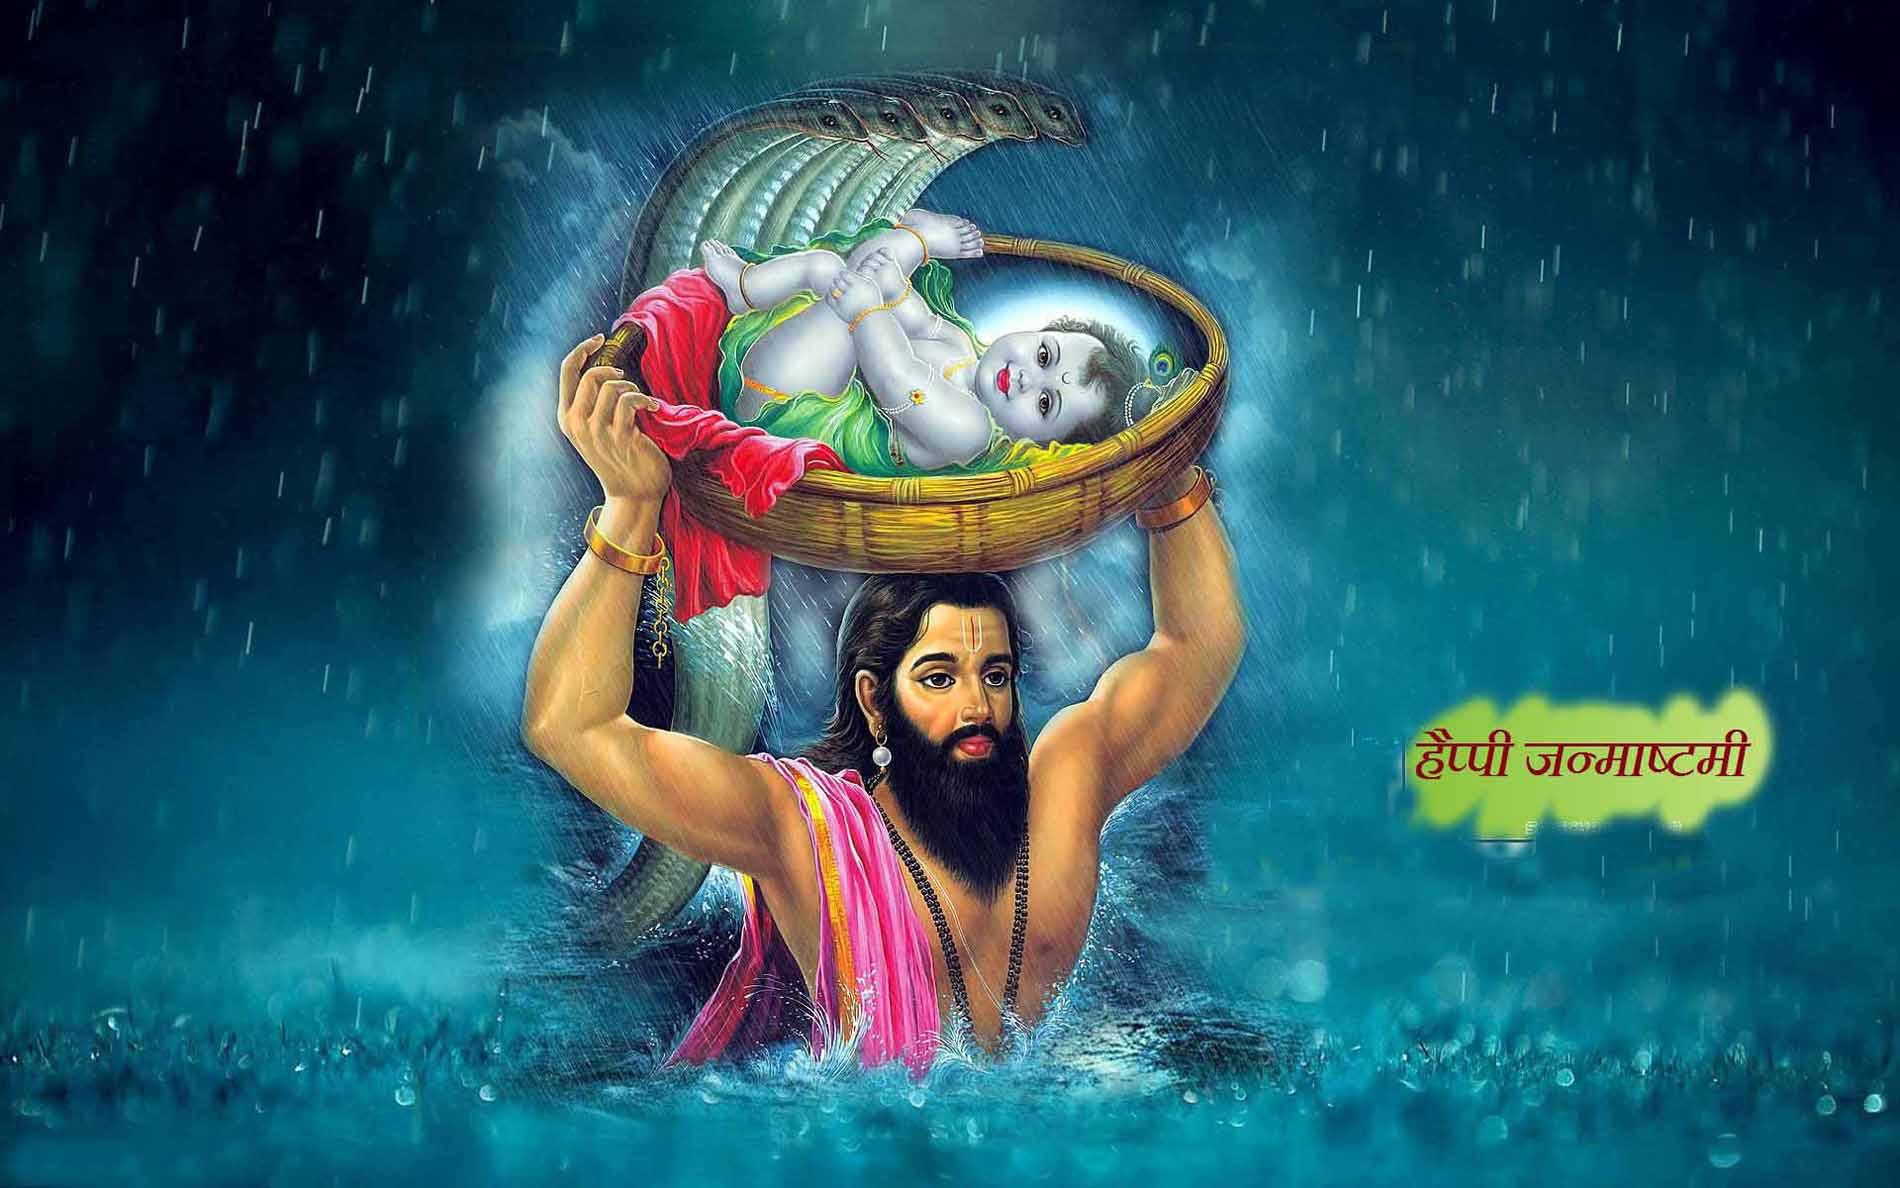 Stupendous-Happy-Krishna-Janmashtami-Messages-Wishes-Greetings-to-celebrate-the-Festival-6